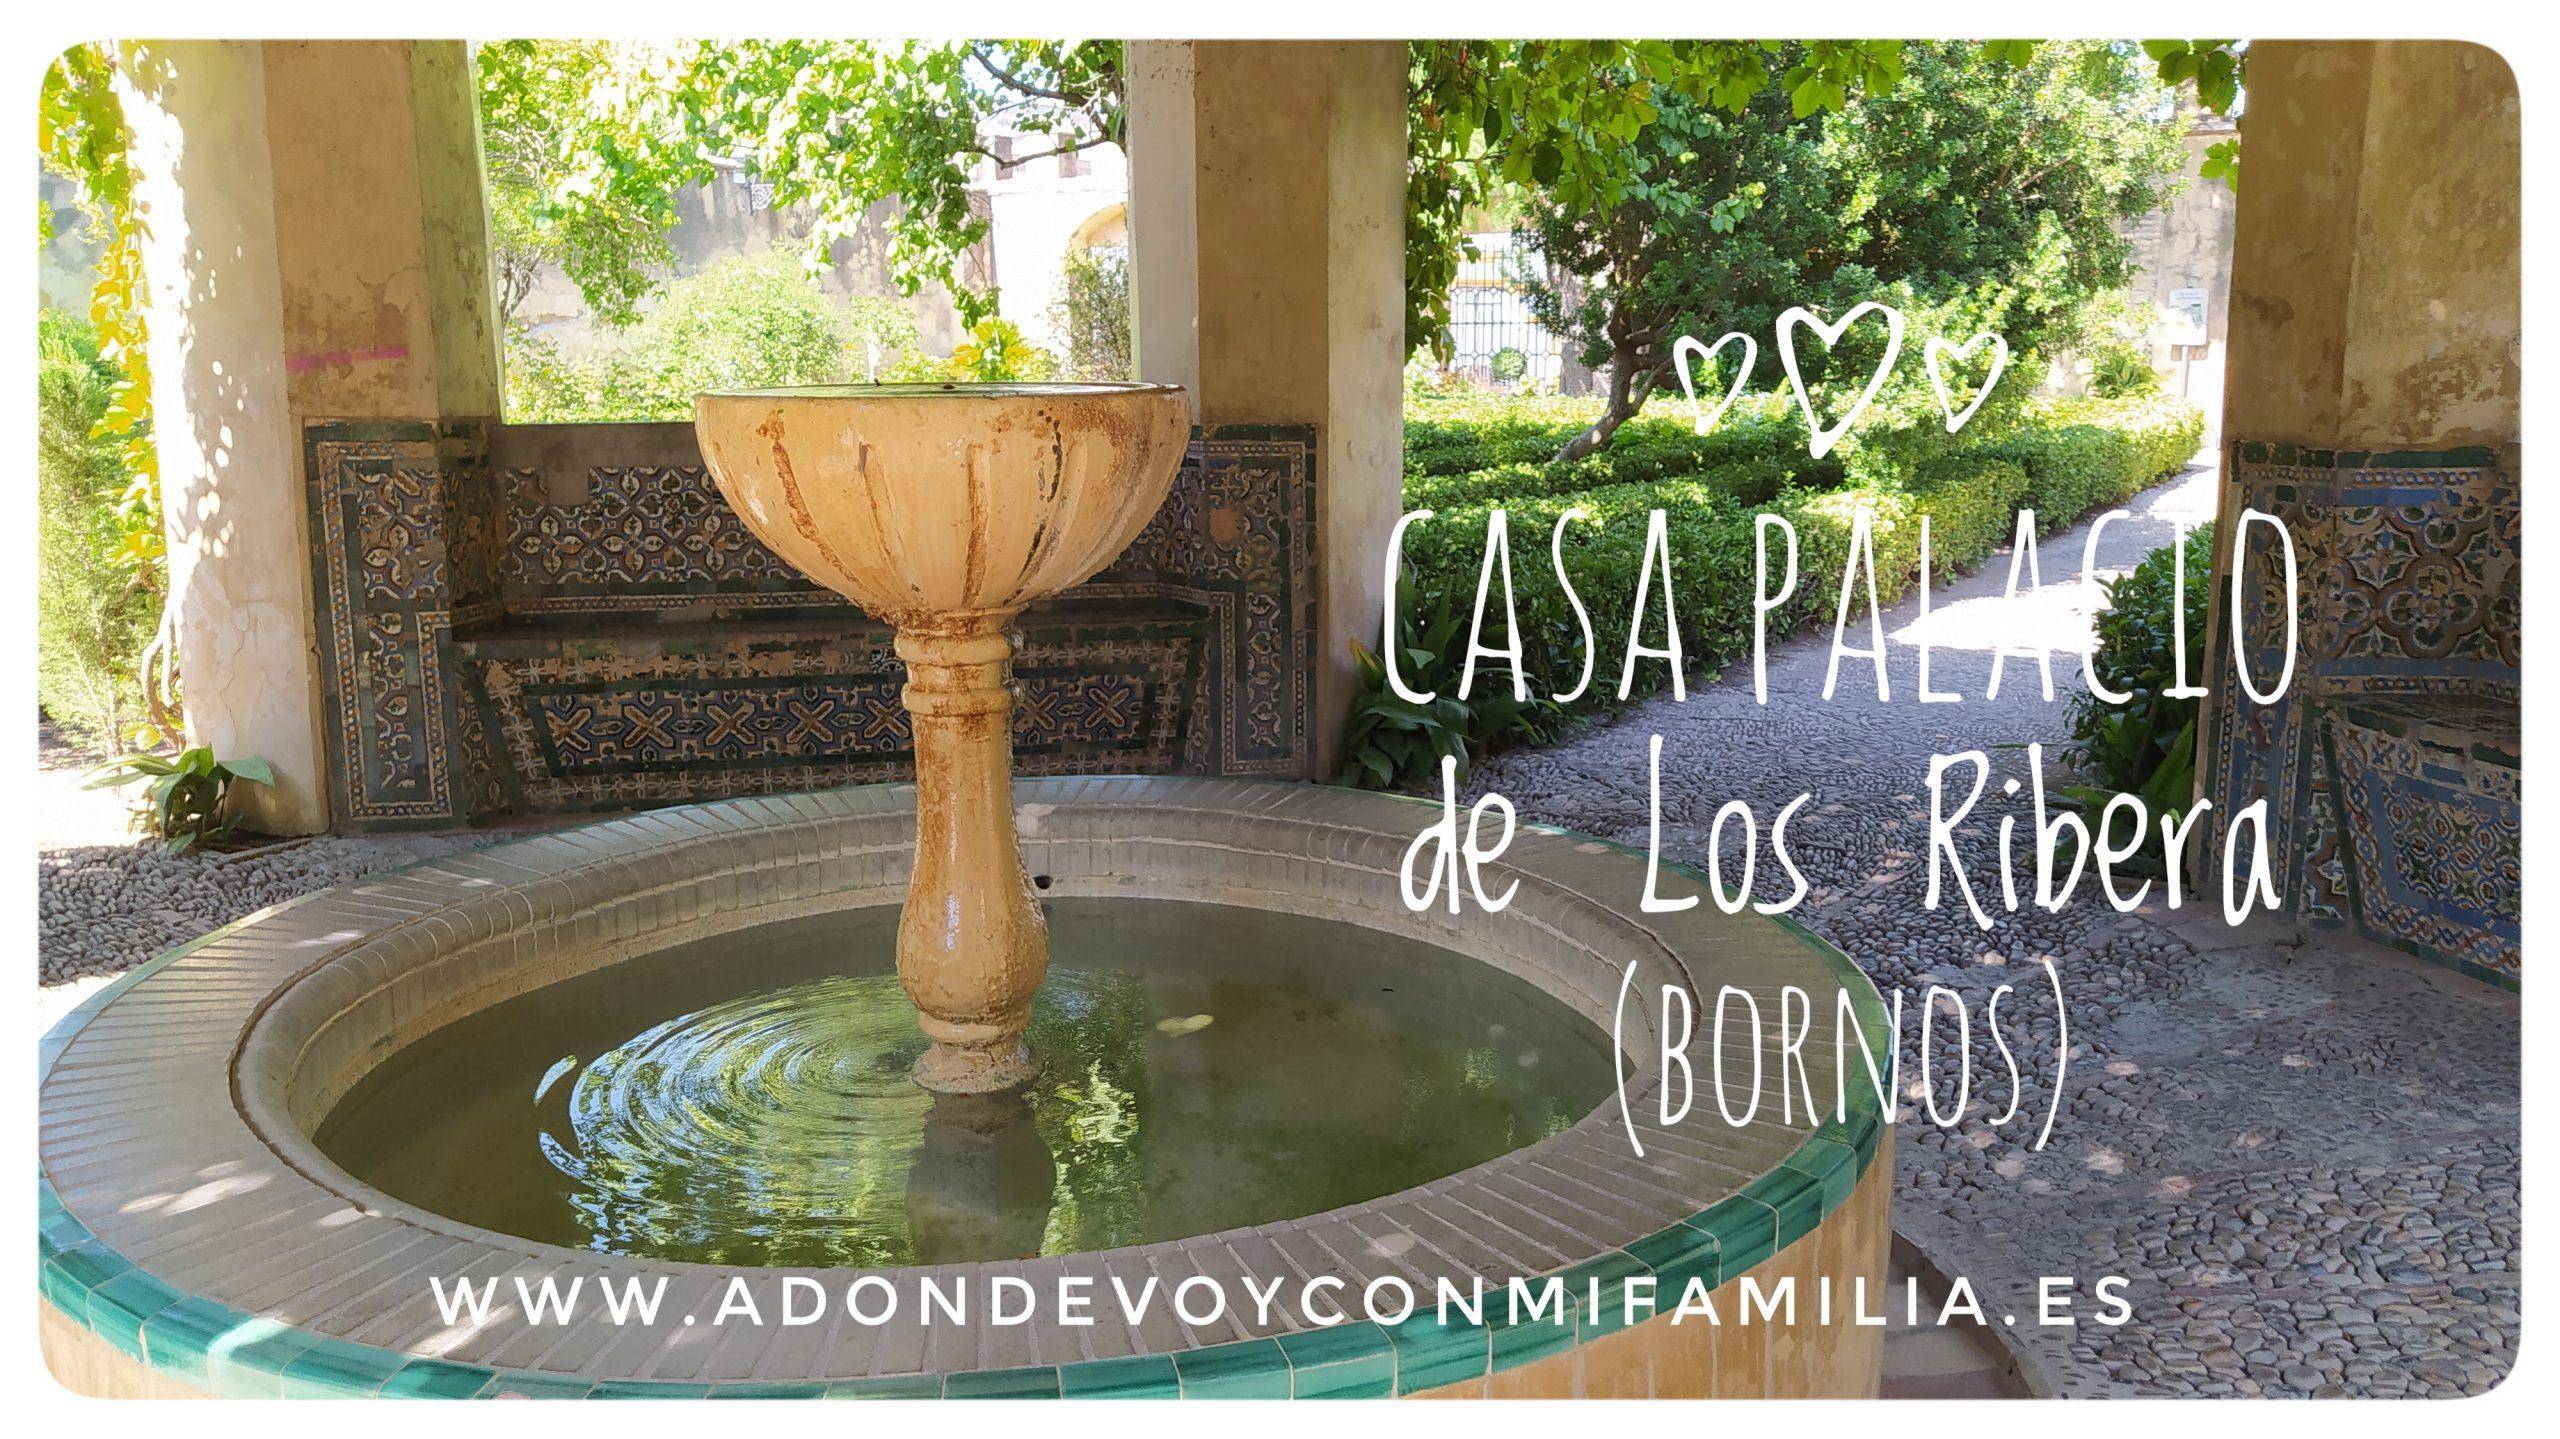 bornos adondevoyconmifamilia (6)